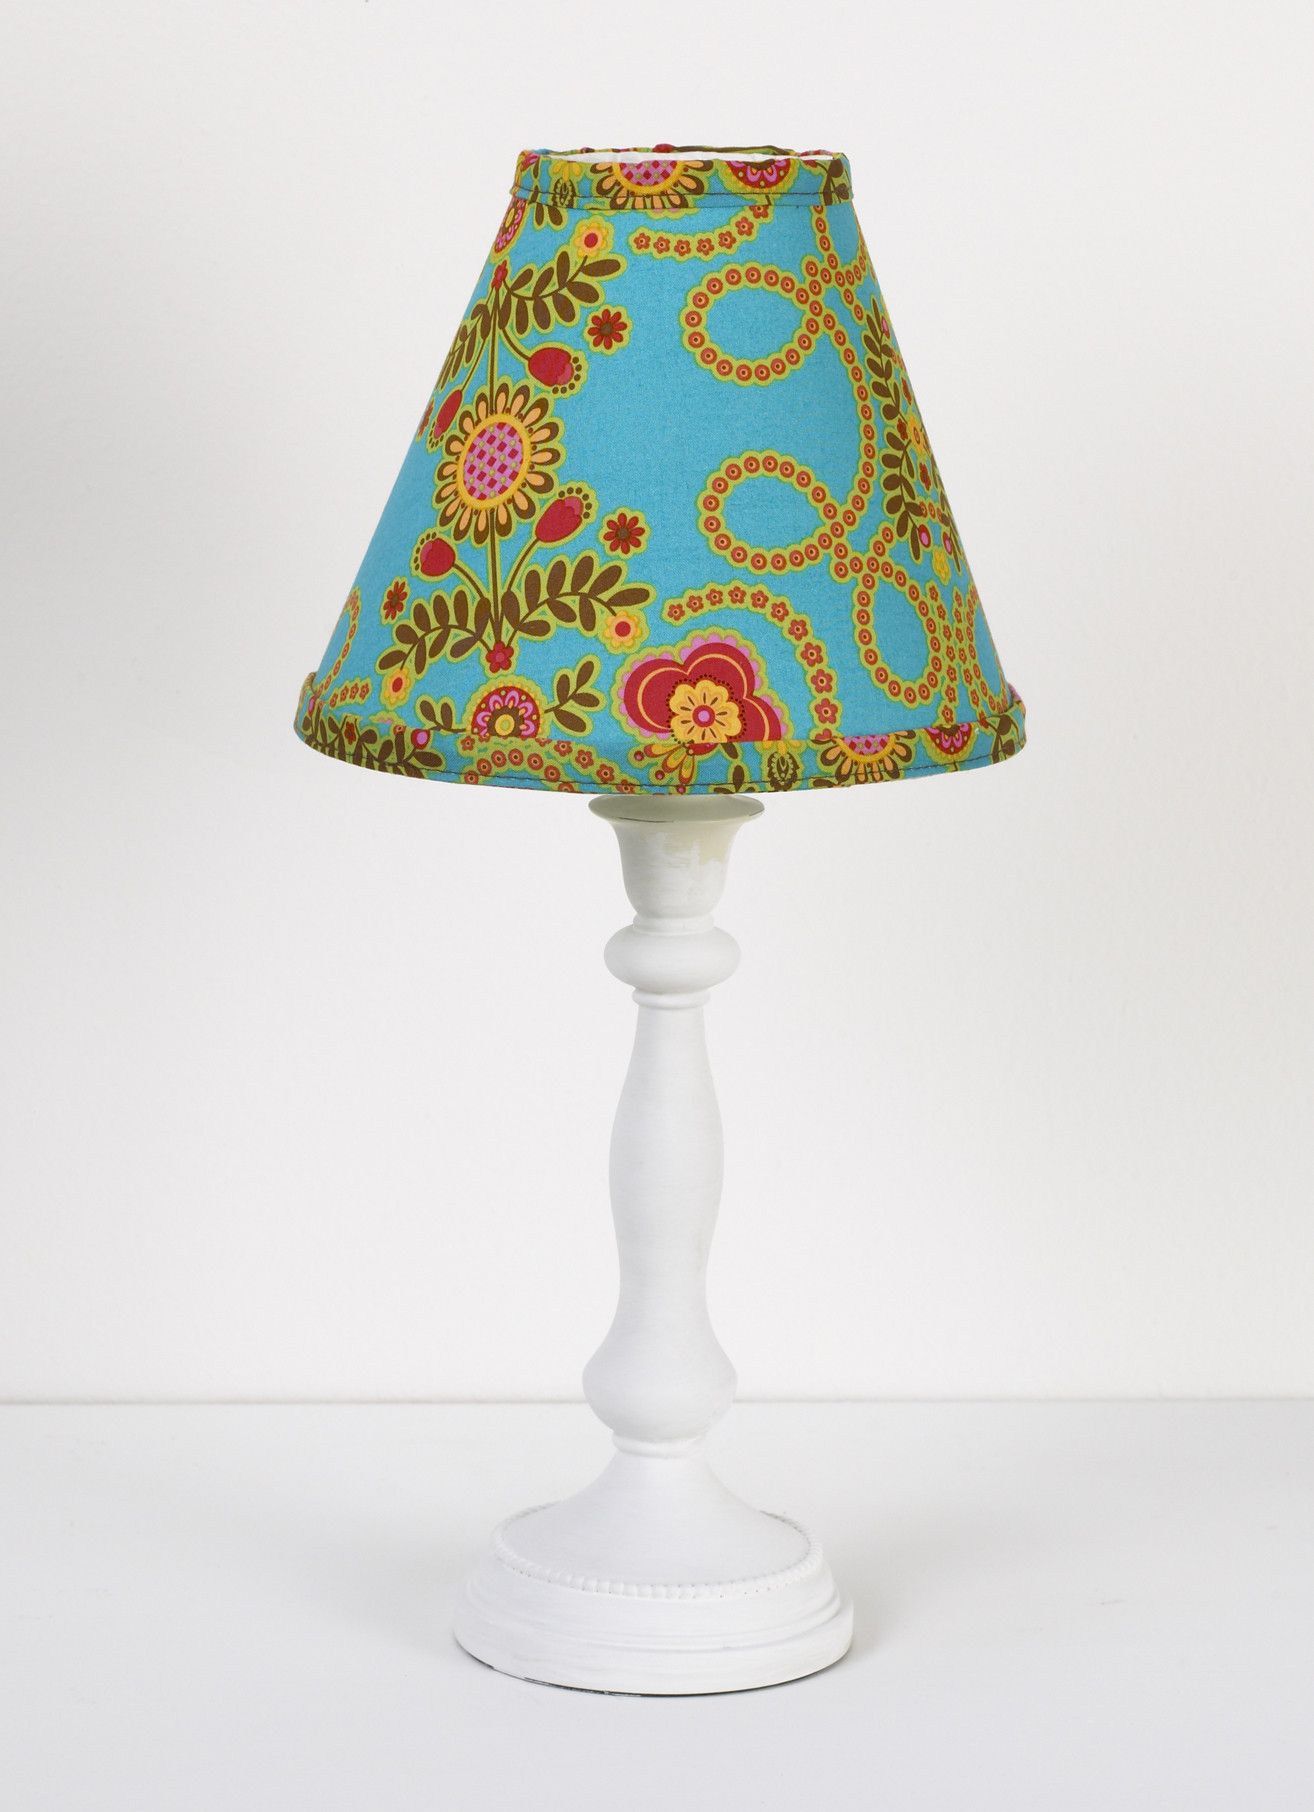 Sweet jojo designs construction zone lamp shade free shipping on - Gypsy Decorative Lamp